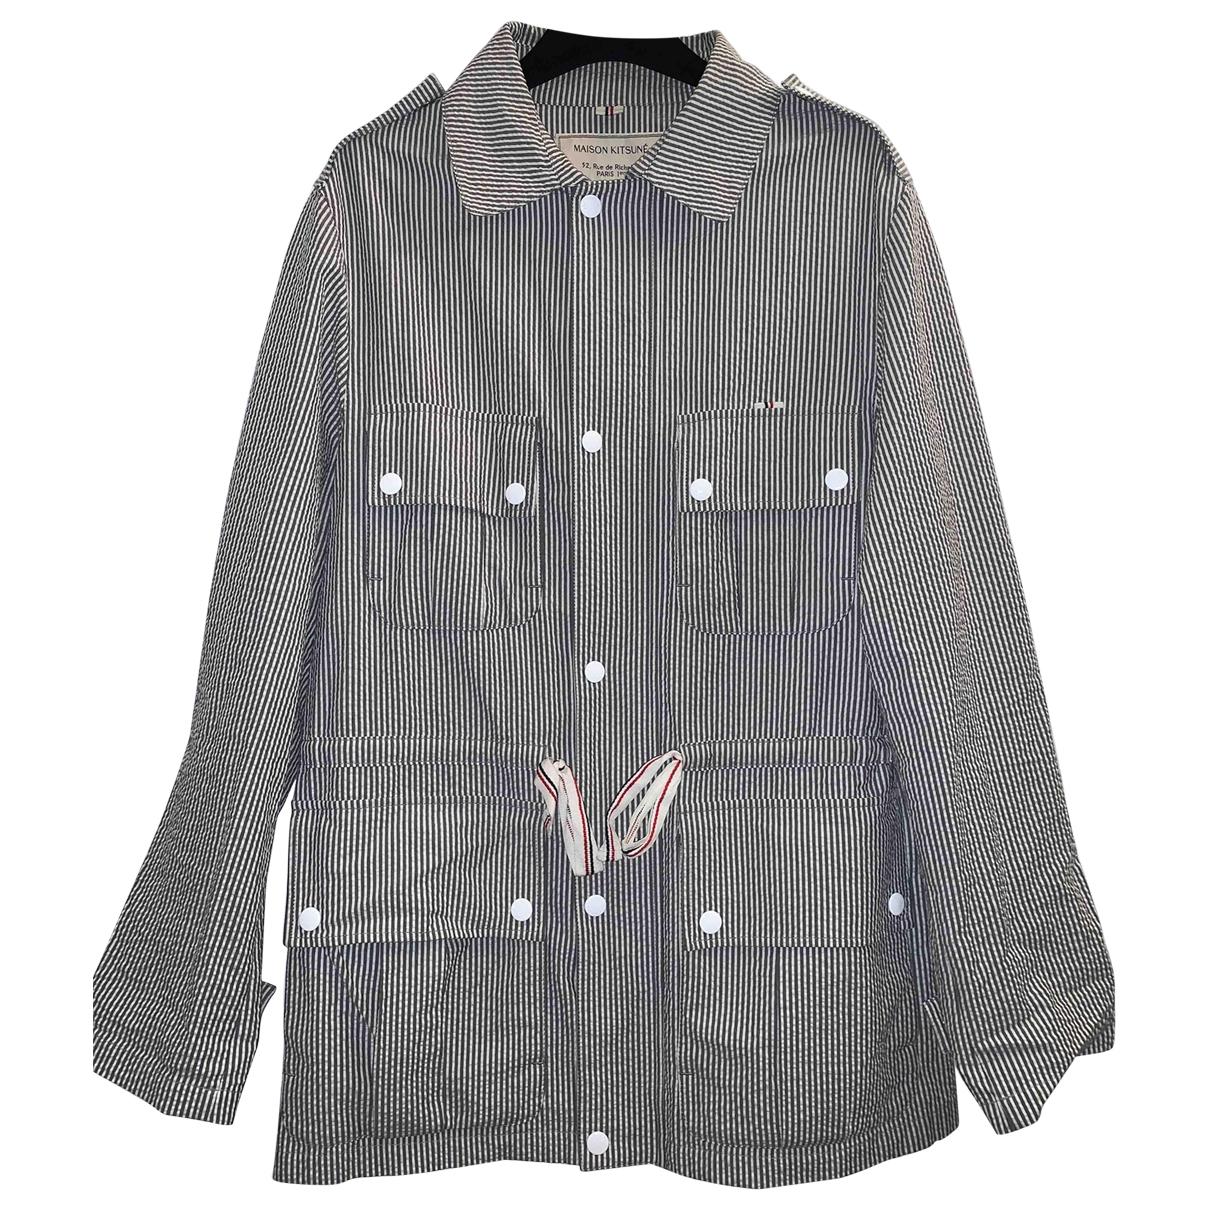 Maison Kitsune \N Blue Cotton jacket  for Men M International